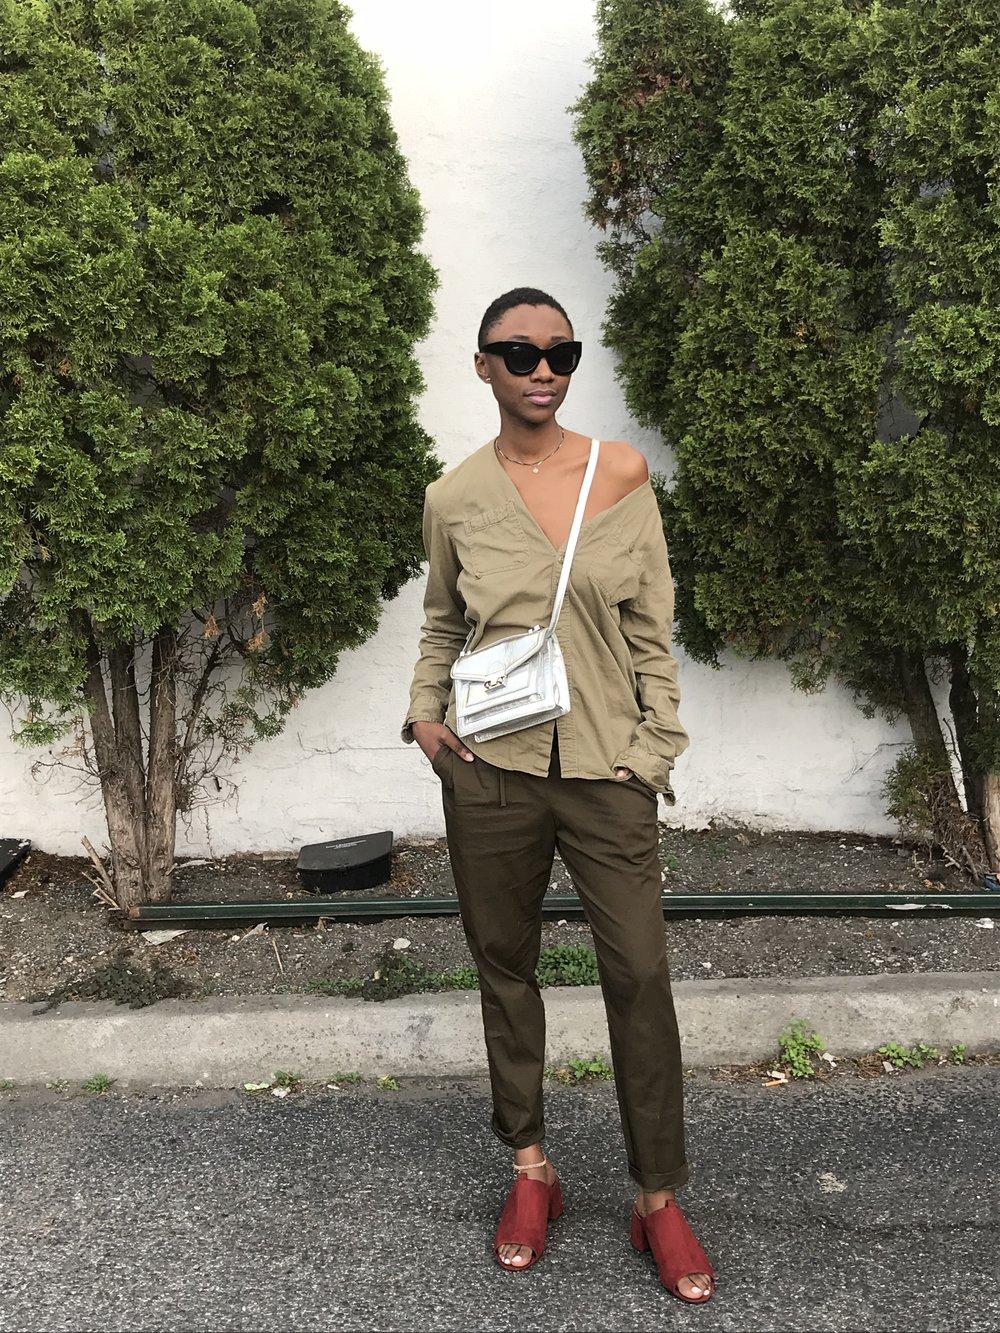 Go Green - Urban Outfitters UO Cross dyed Stevens button down shirt, Zara Drawstring trousers, high heel mule sandal, Loeffler Randall crossbody bag in silver foil lambskin